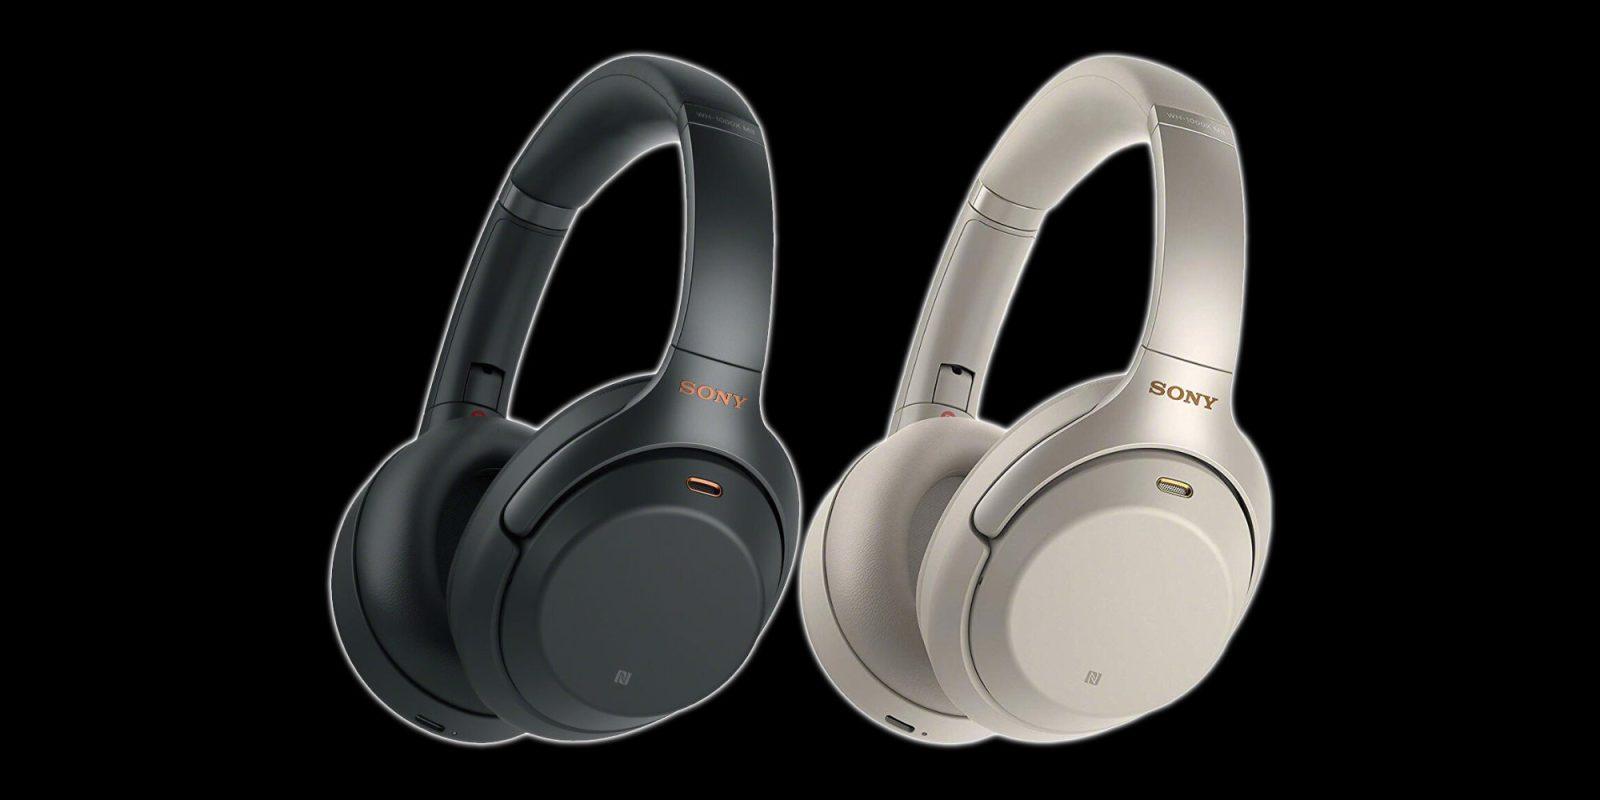 New ANC headphone lows: Sony XM3 $215 (Reg. $348) or Bose QC35 II $210, more